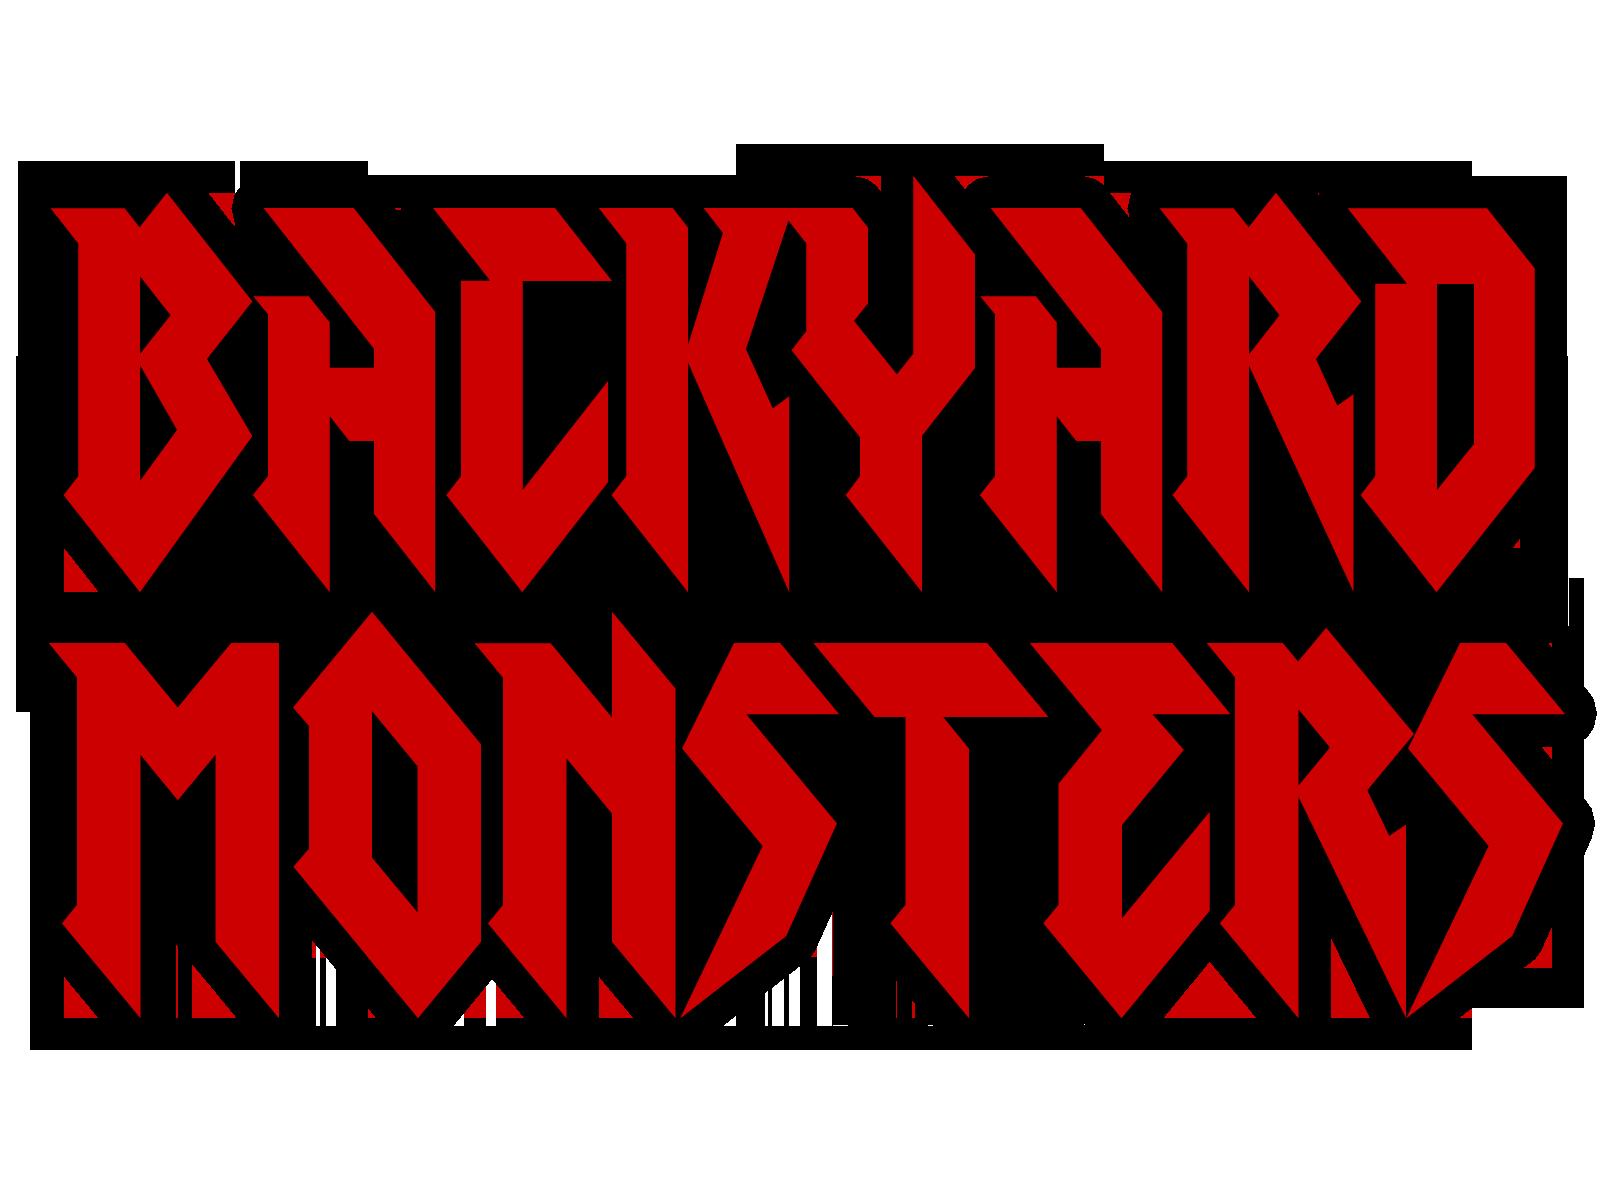 Backyard Monsters   Backyard Monsters Unleashed Wiki ...